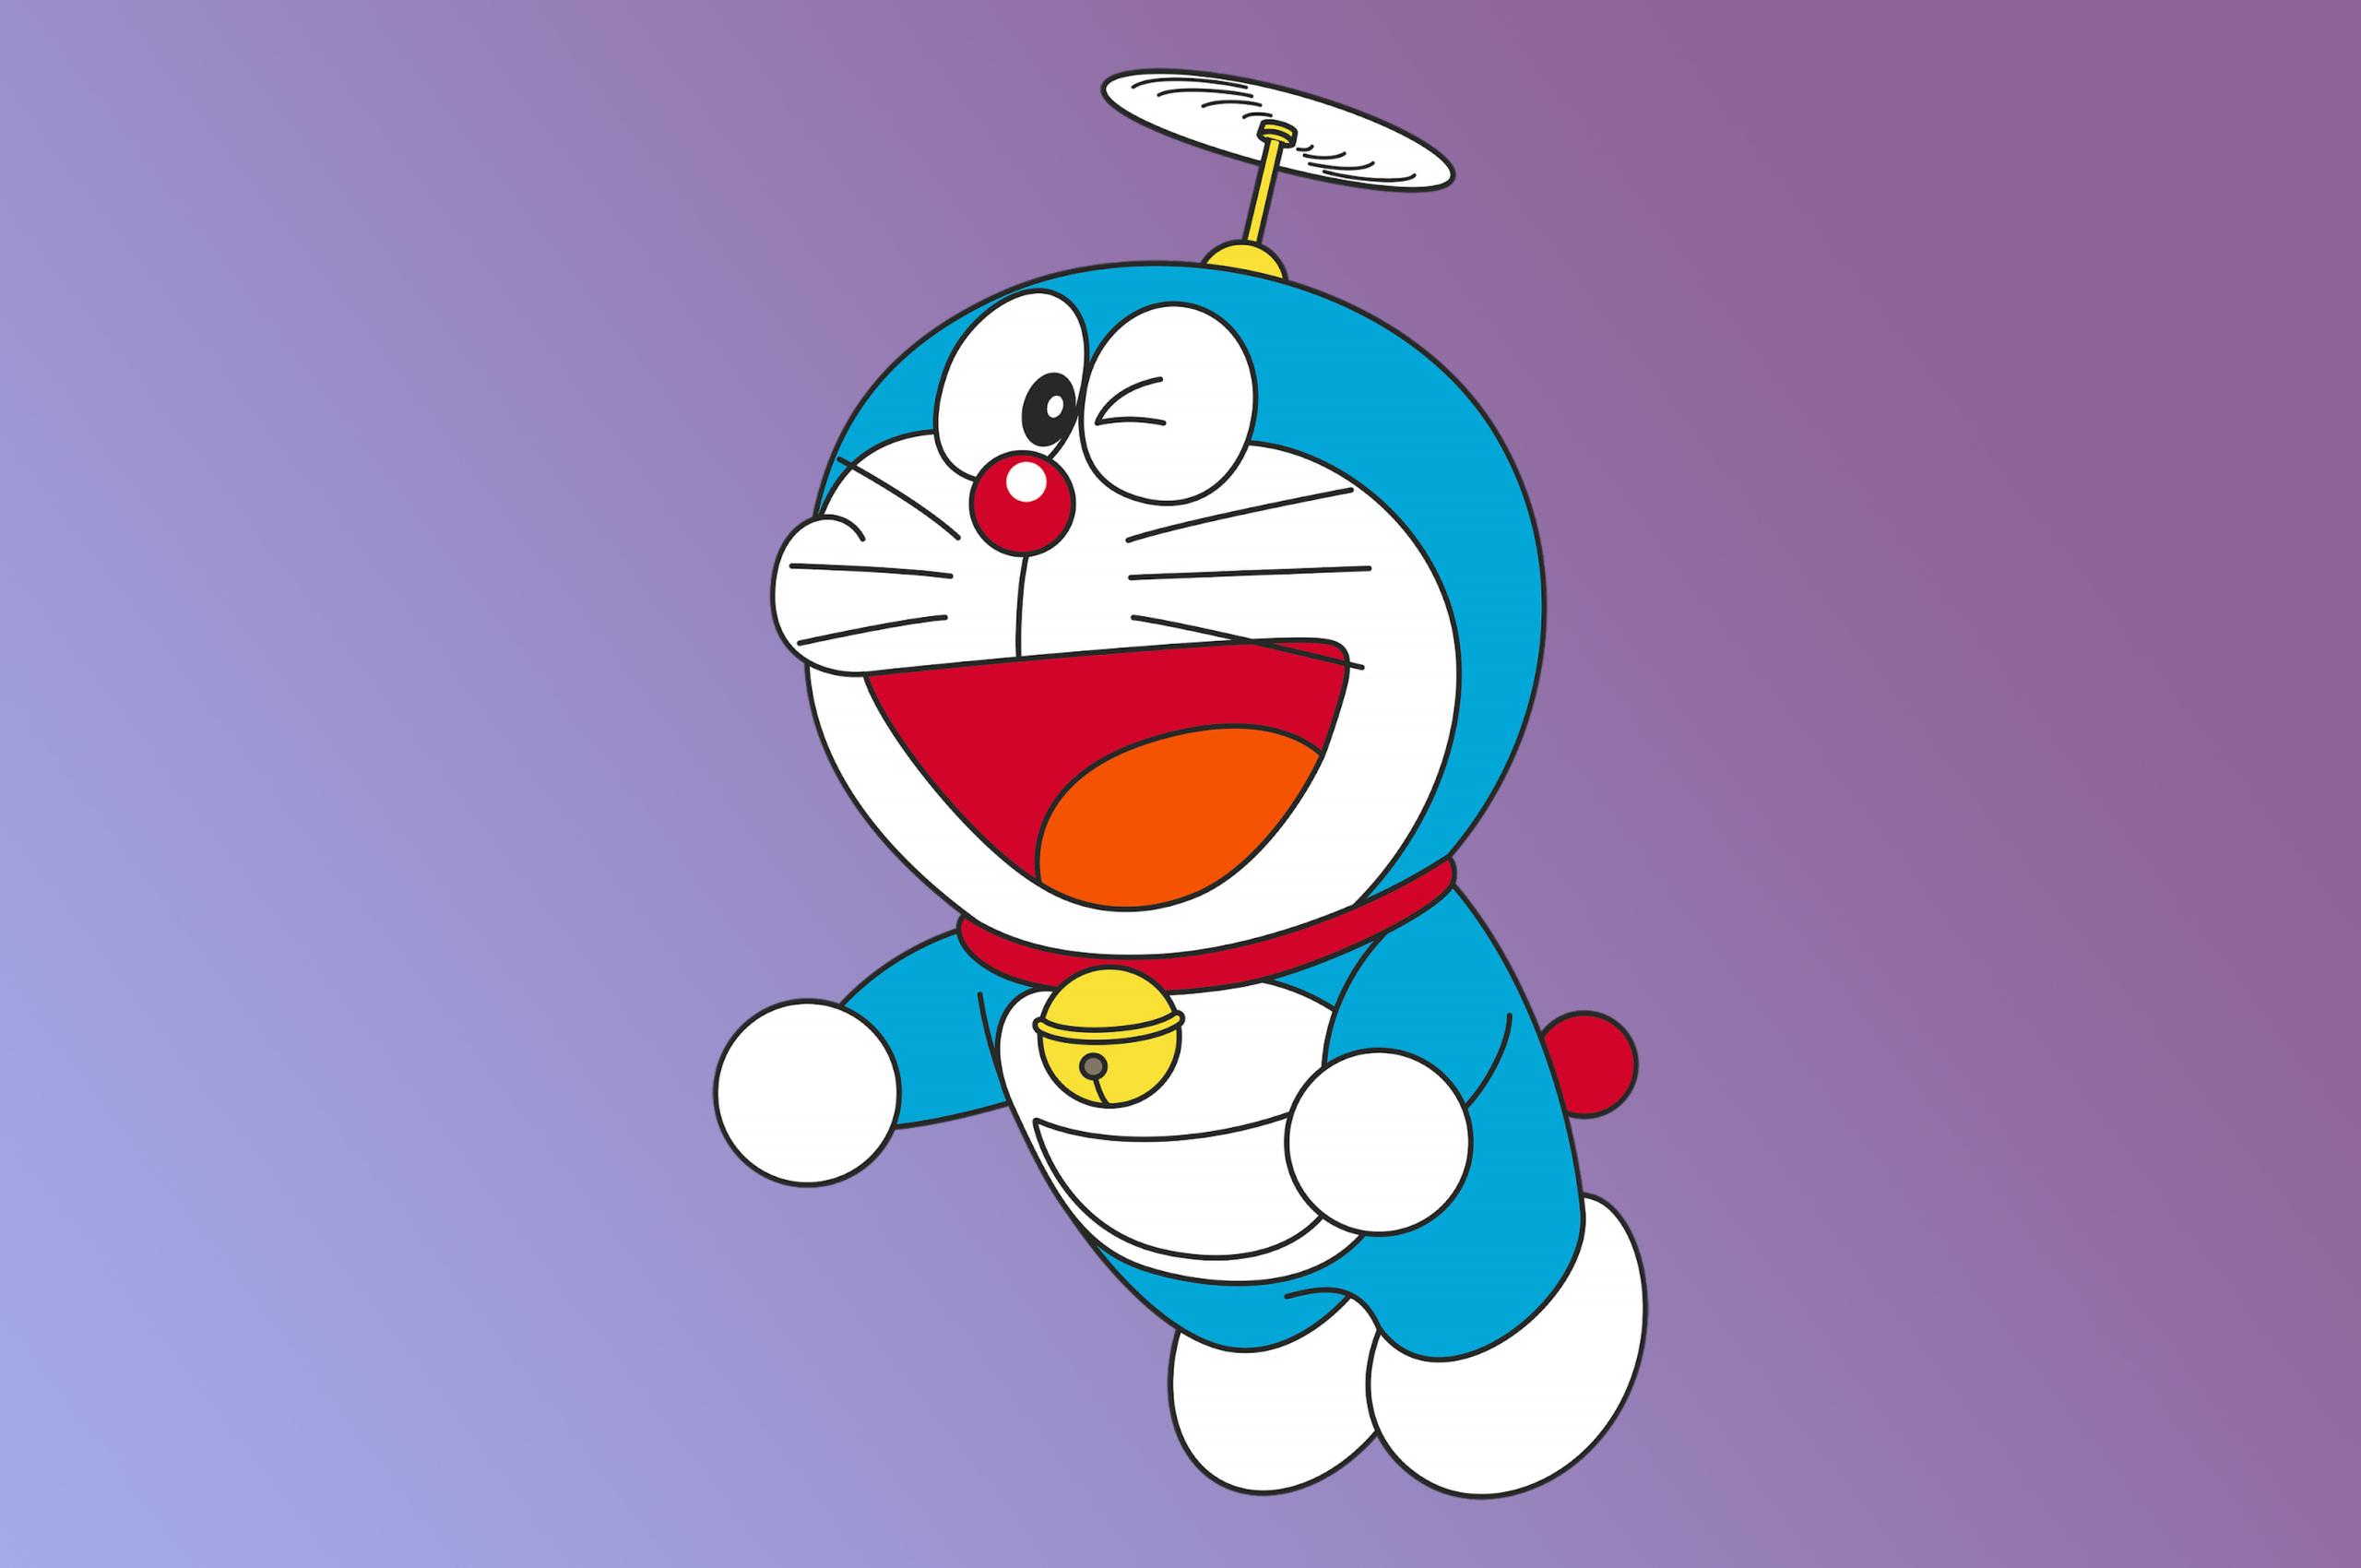 2560x1700 Doraemon Minimal 4K Chromebook Pixel Wallpaper ...